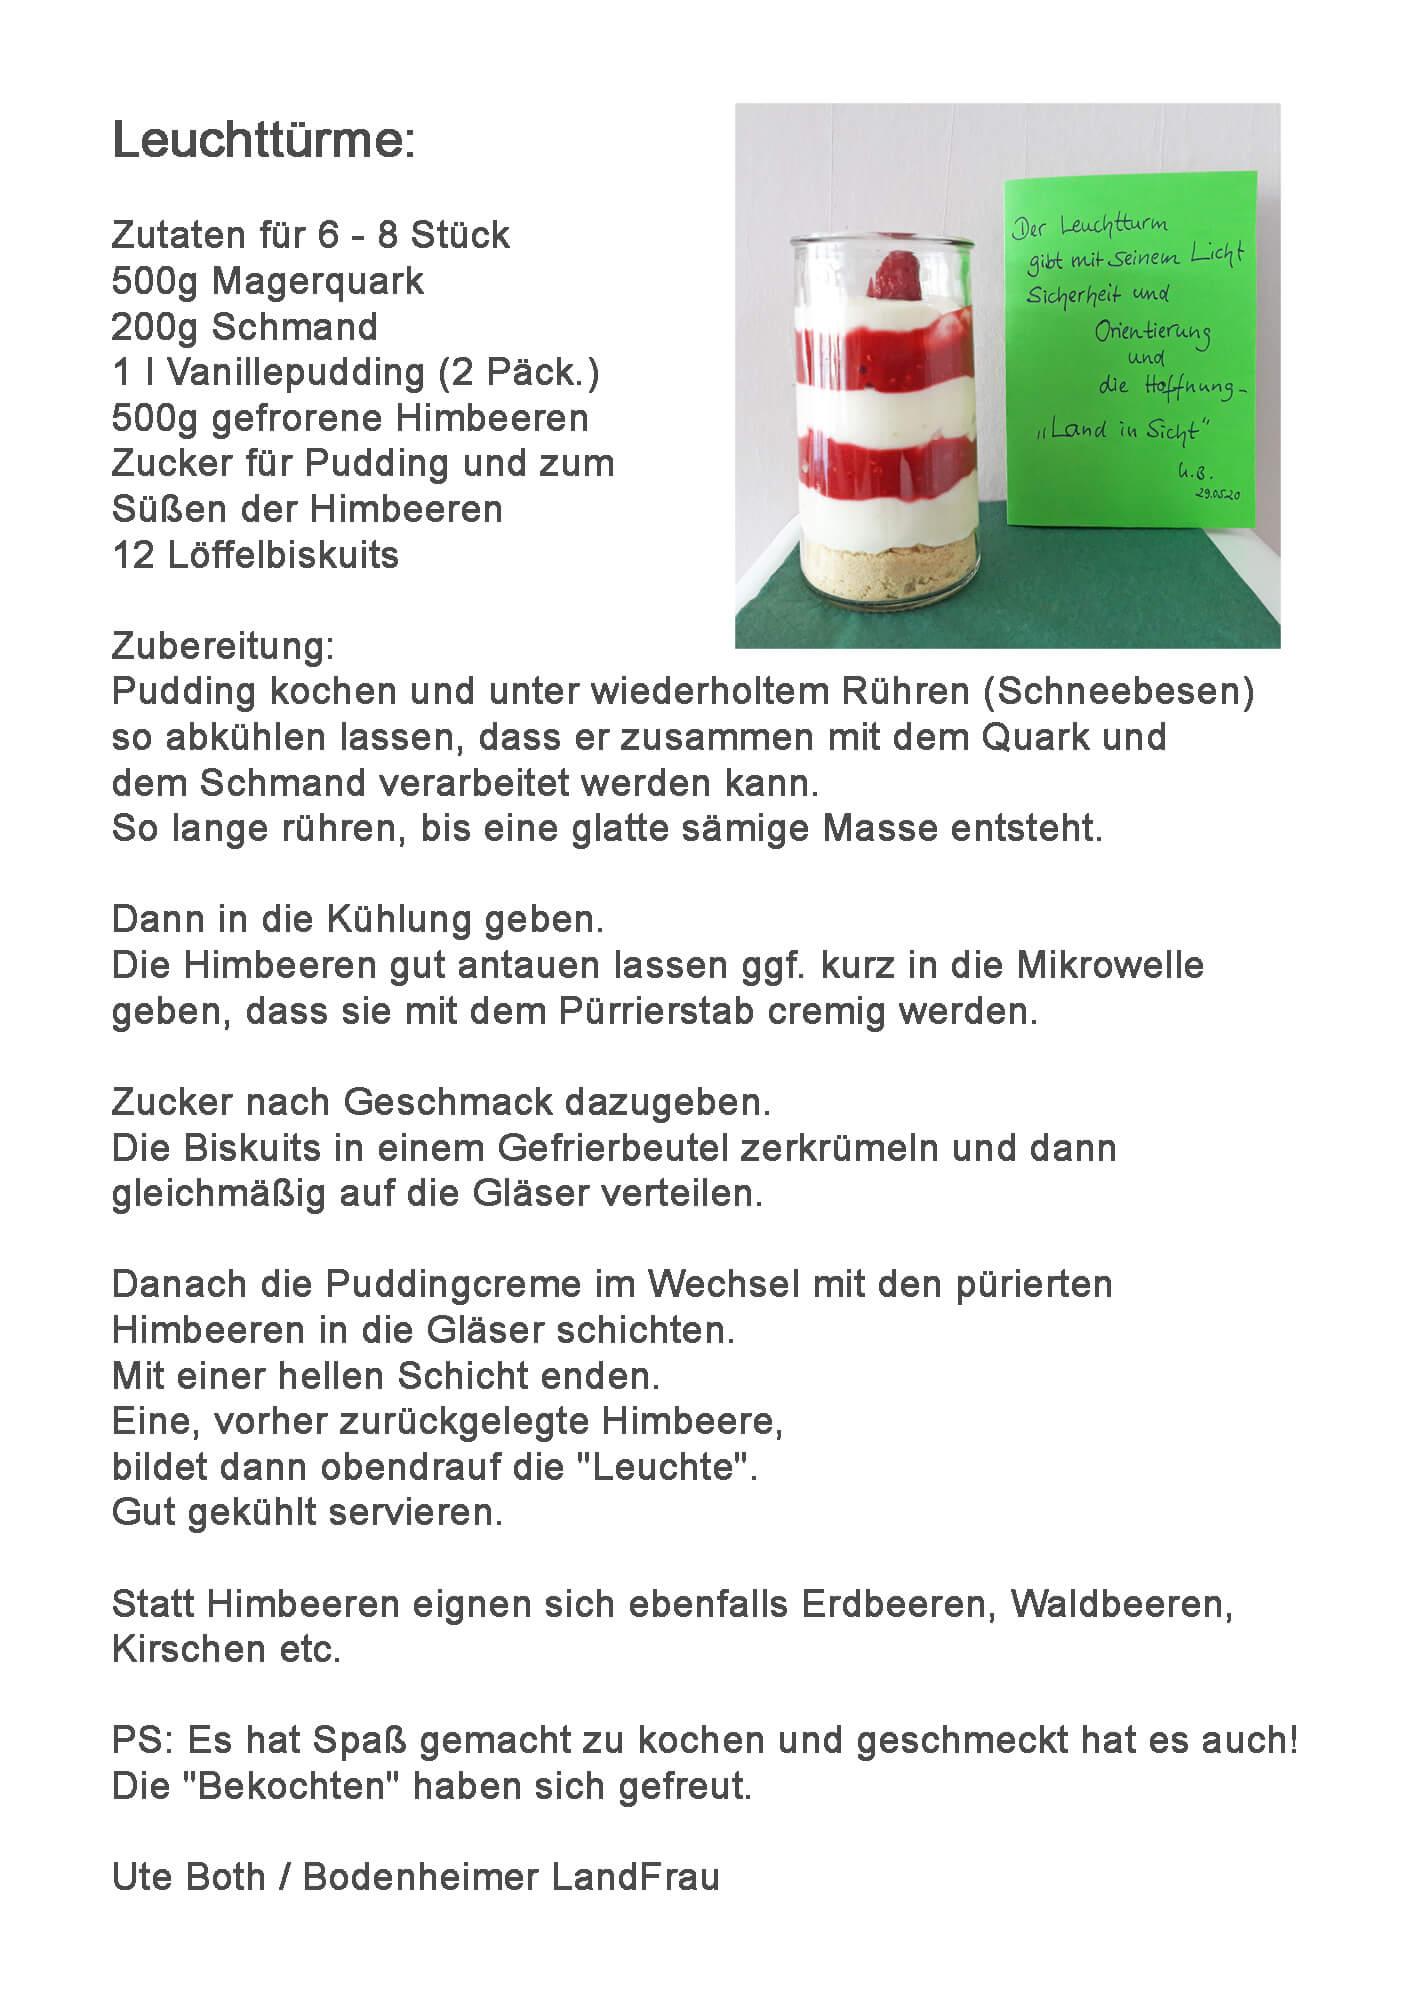 13d Rezept_Leuchttürme, LandFrau